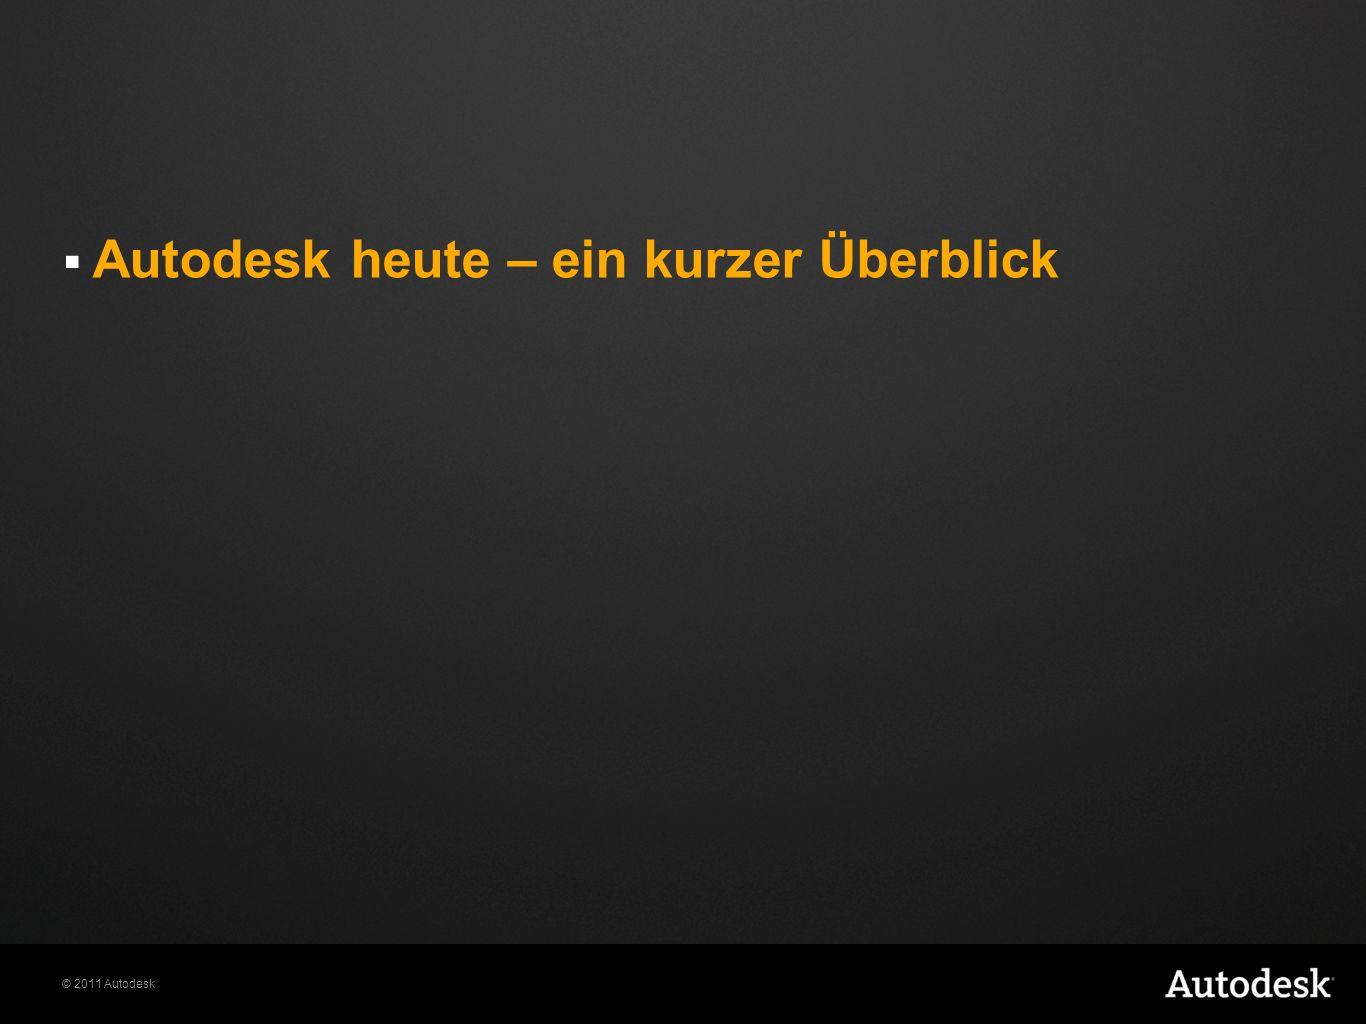 © 2011 Autodesk Autodesk heute – ein kurzer Überblick